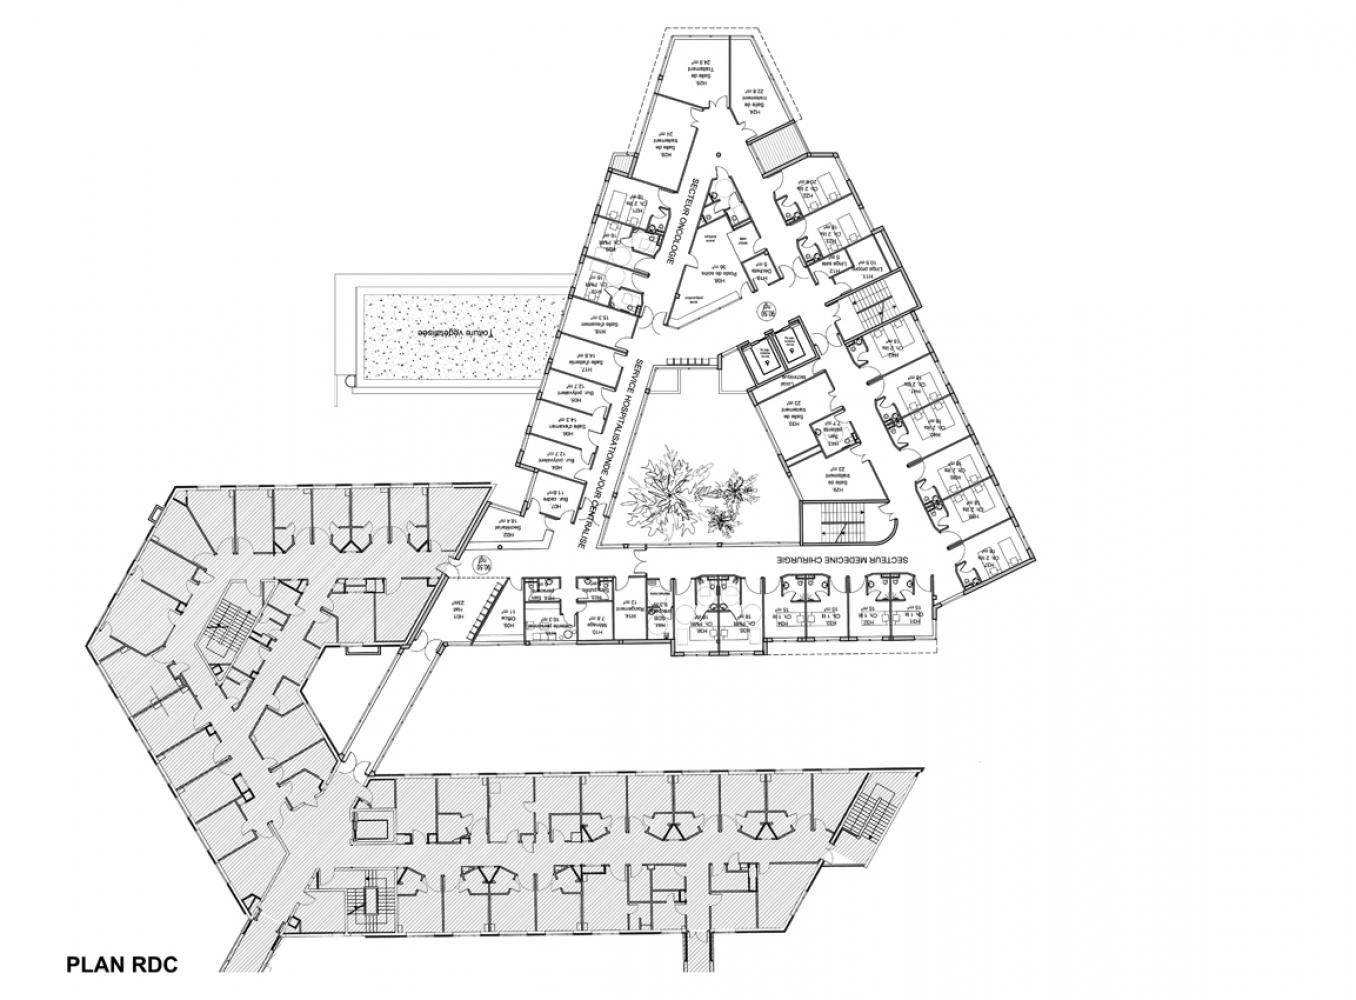 zbeau---03 Pascale SEURIN Architecte - Pascale SEURIN Architecte